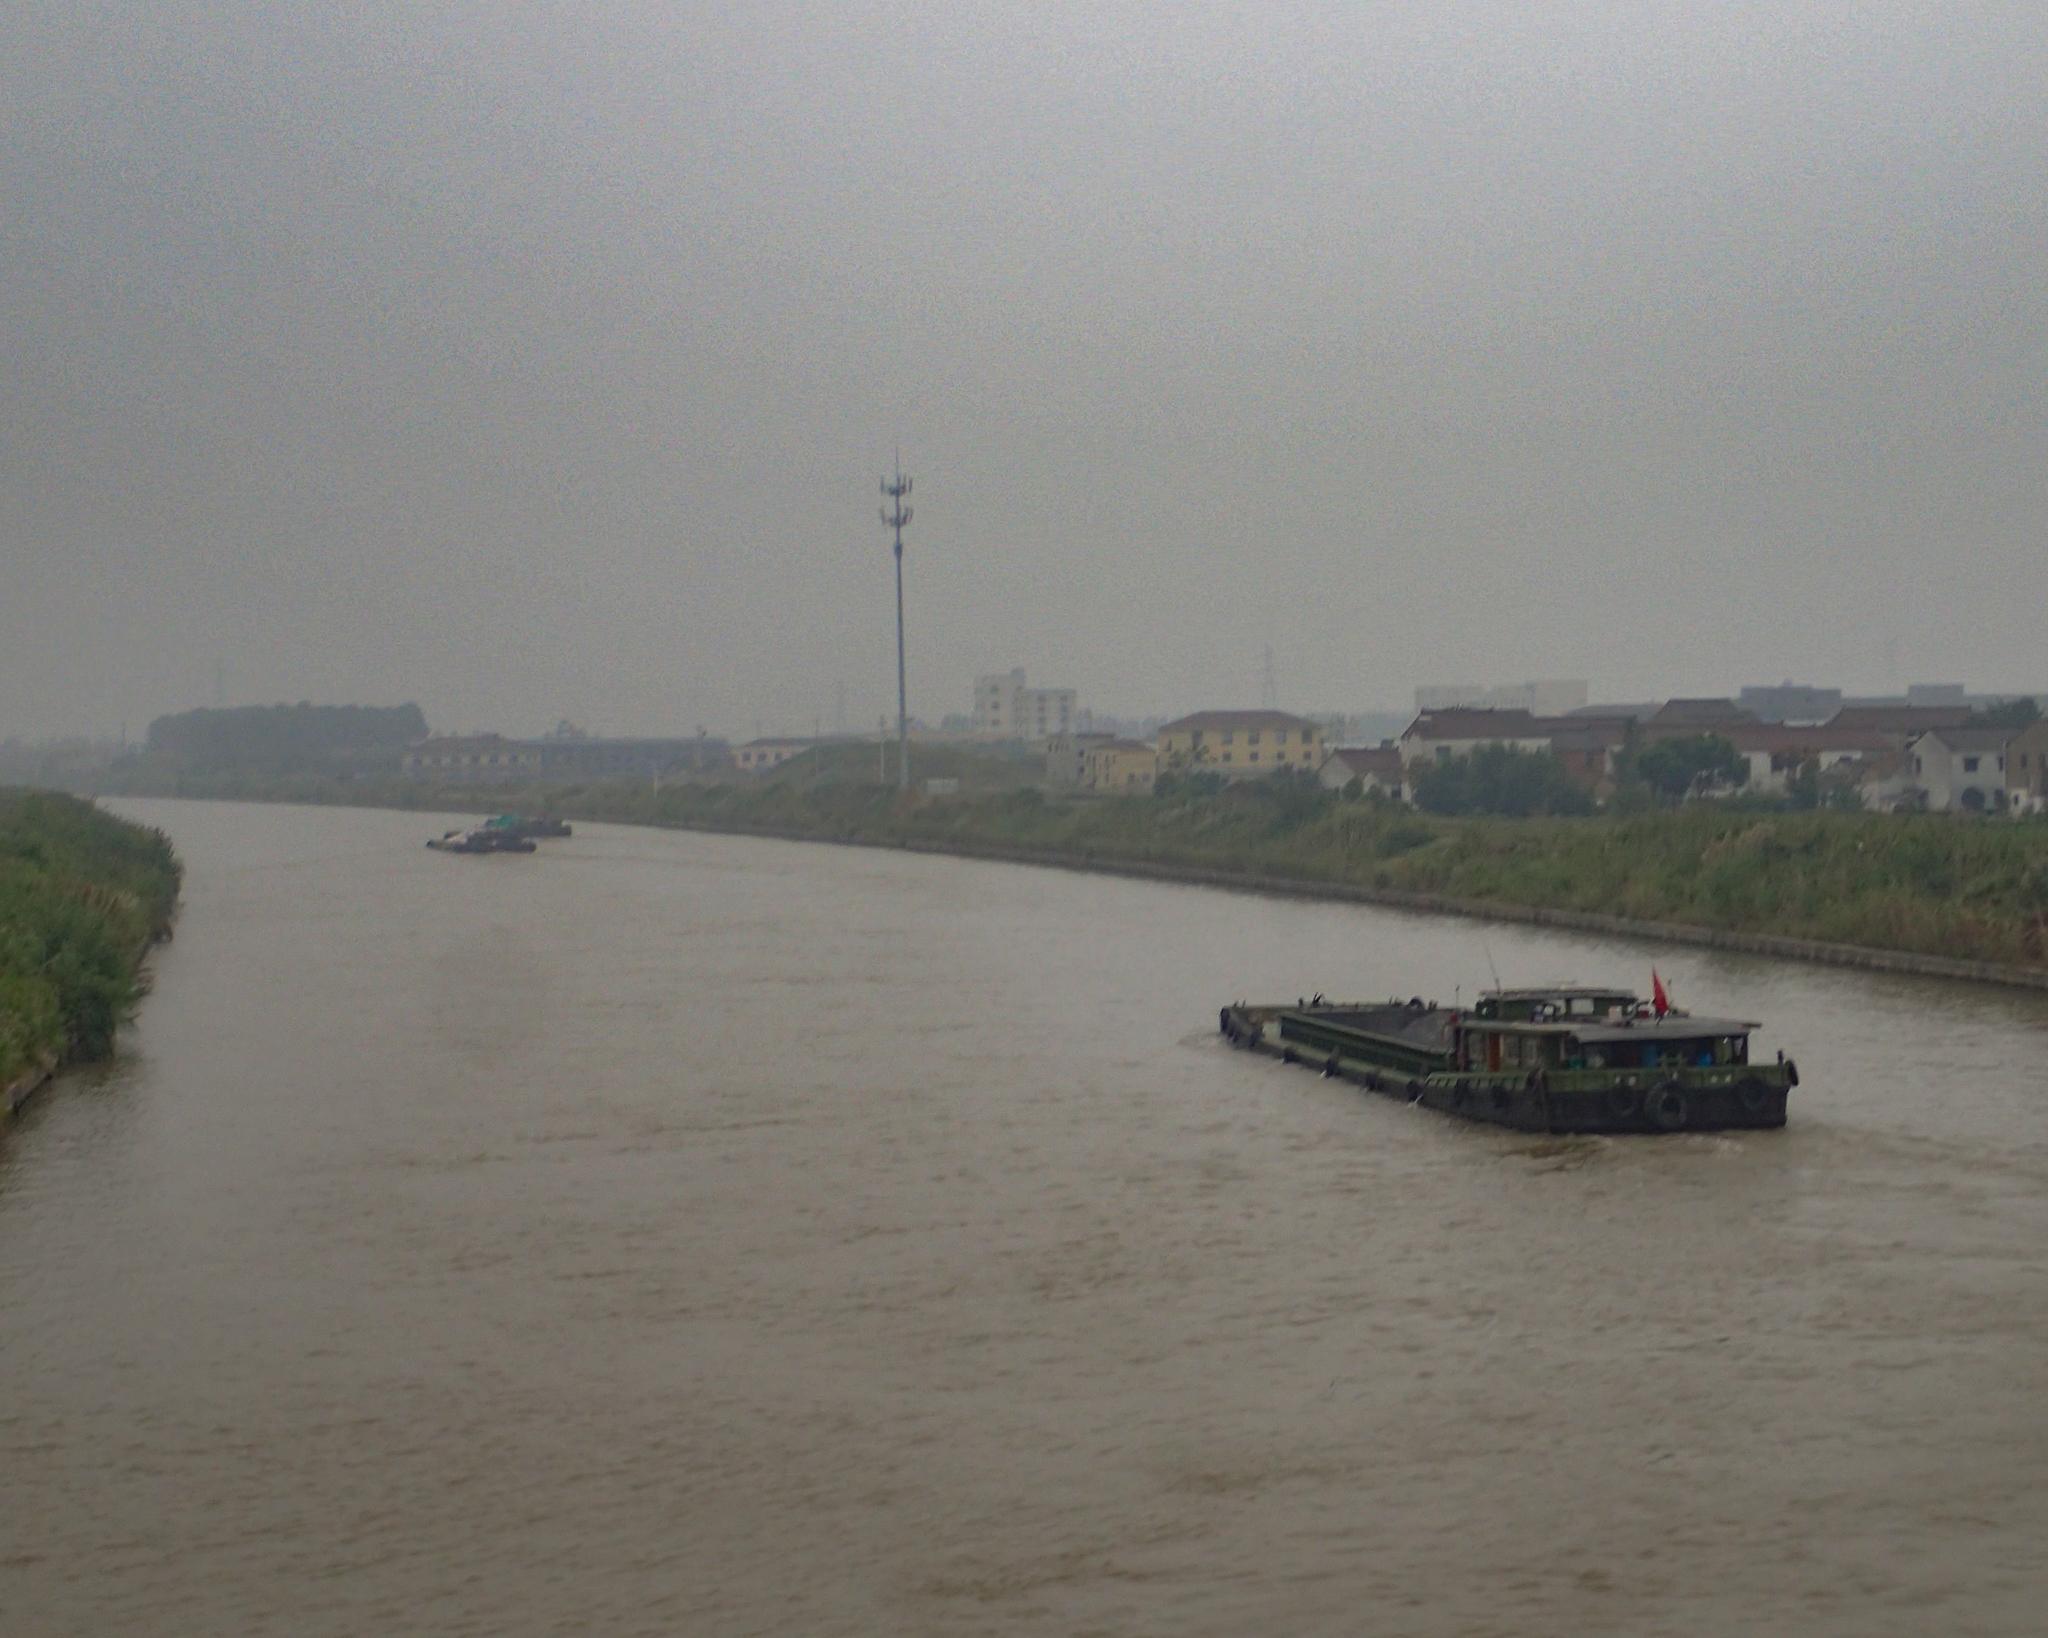 Barge on the Yangtze river